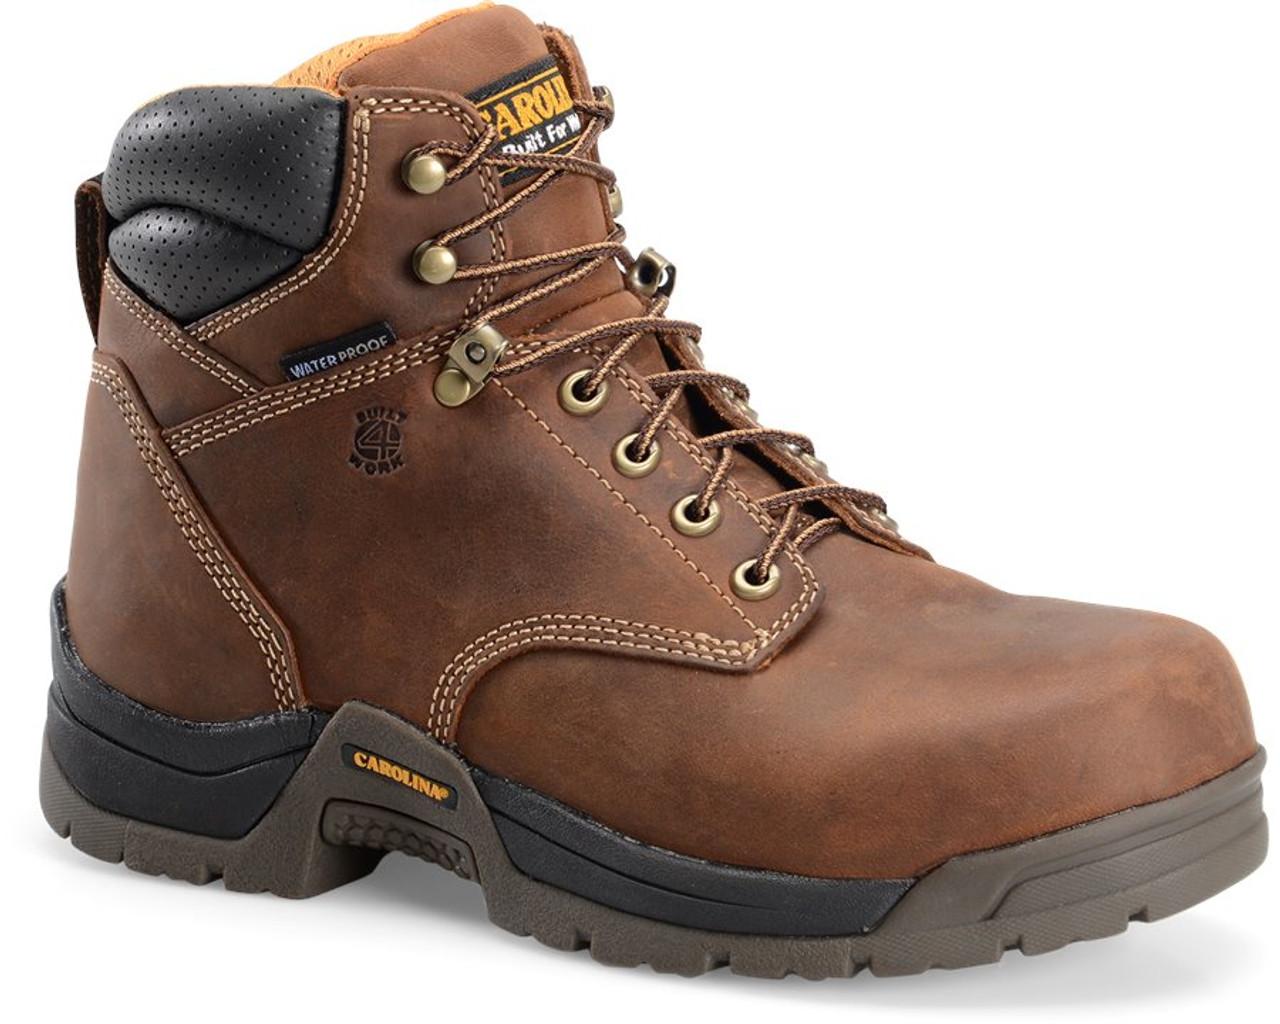 Carolina BRUNO LO  Waterproof Broad Toe Work Boot - CA5020